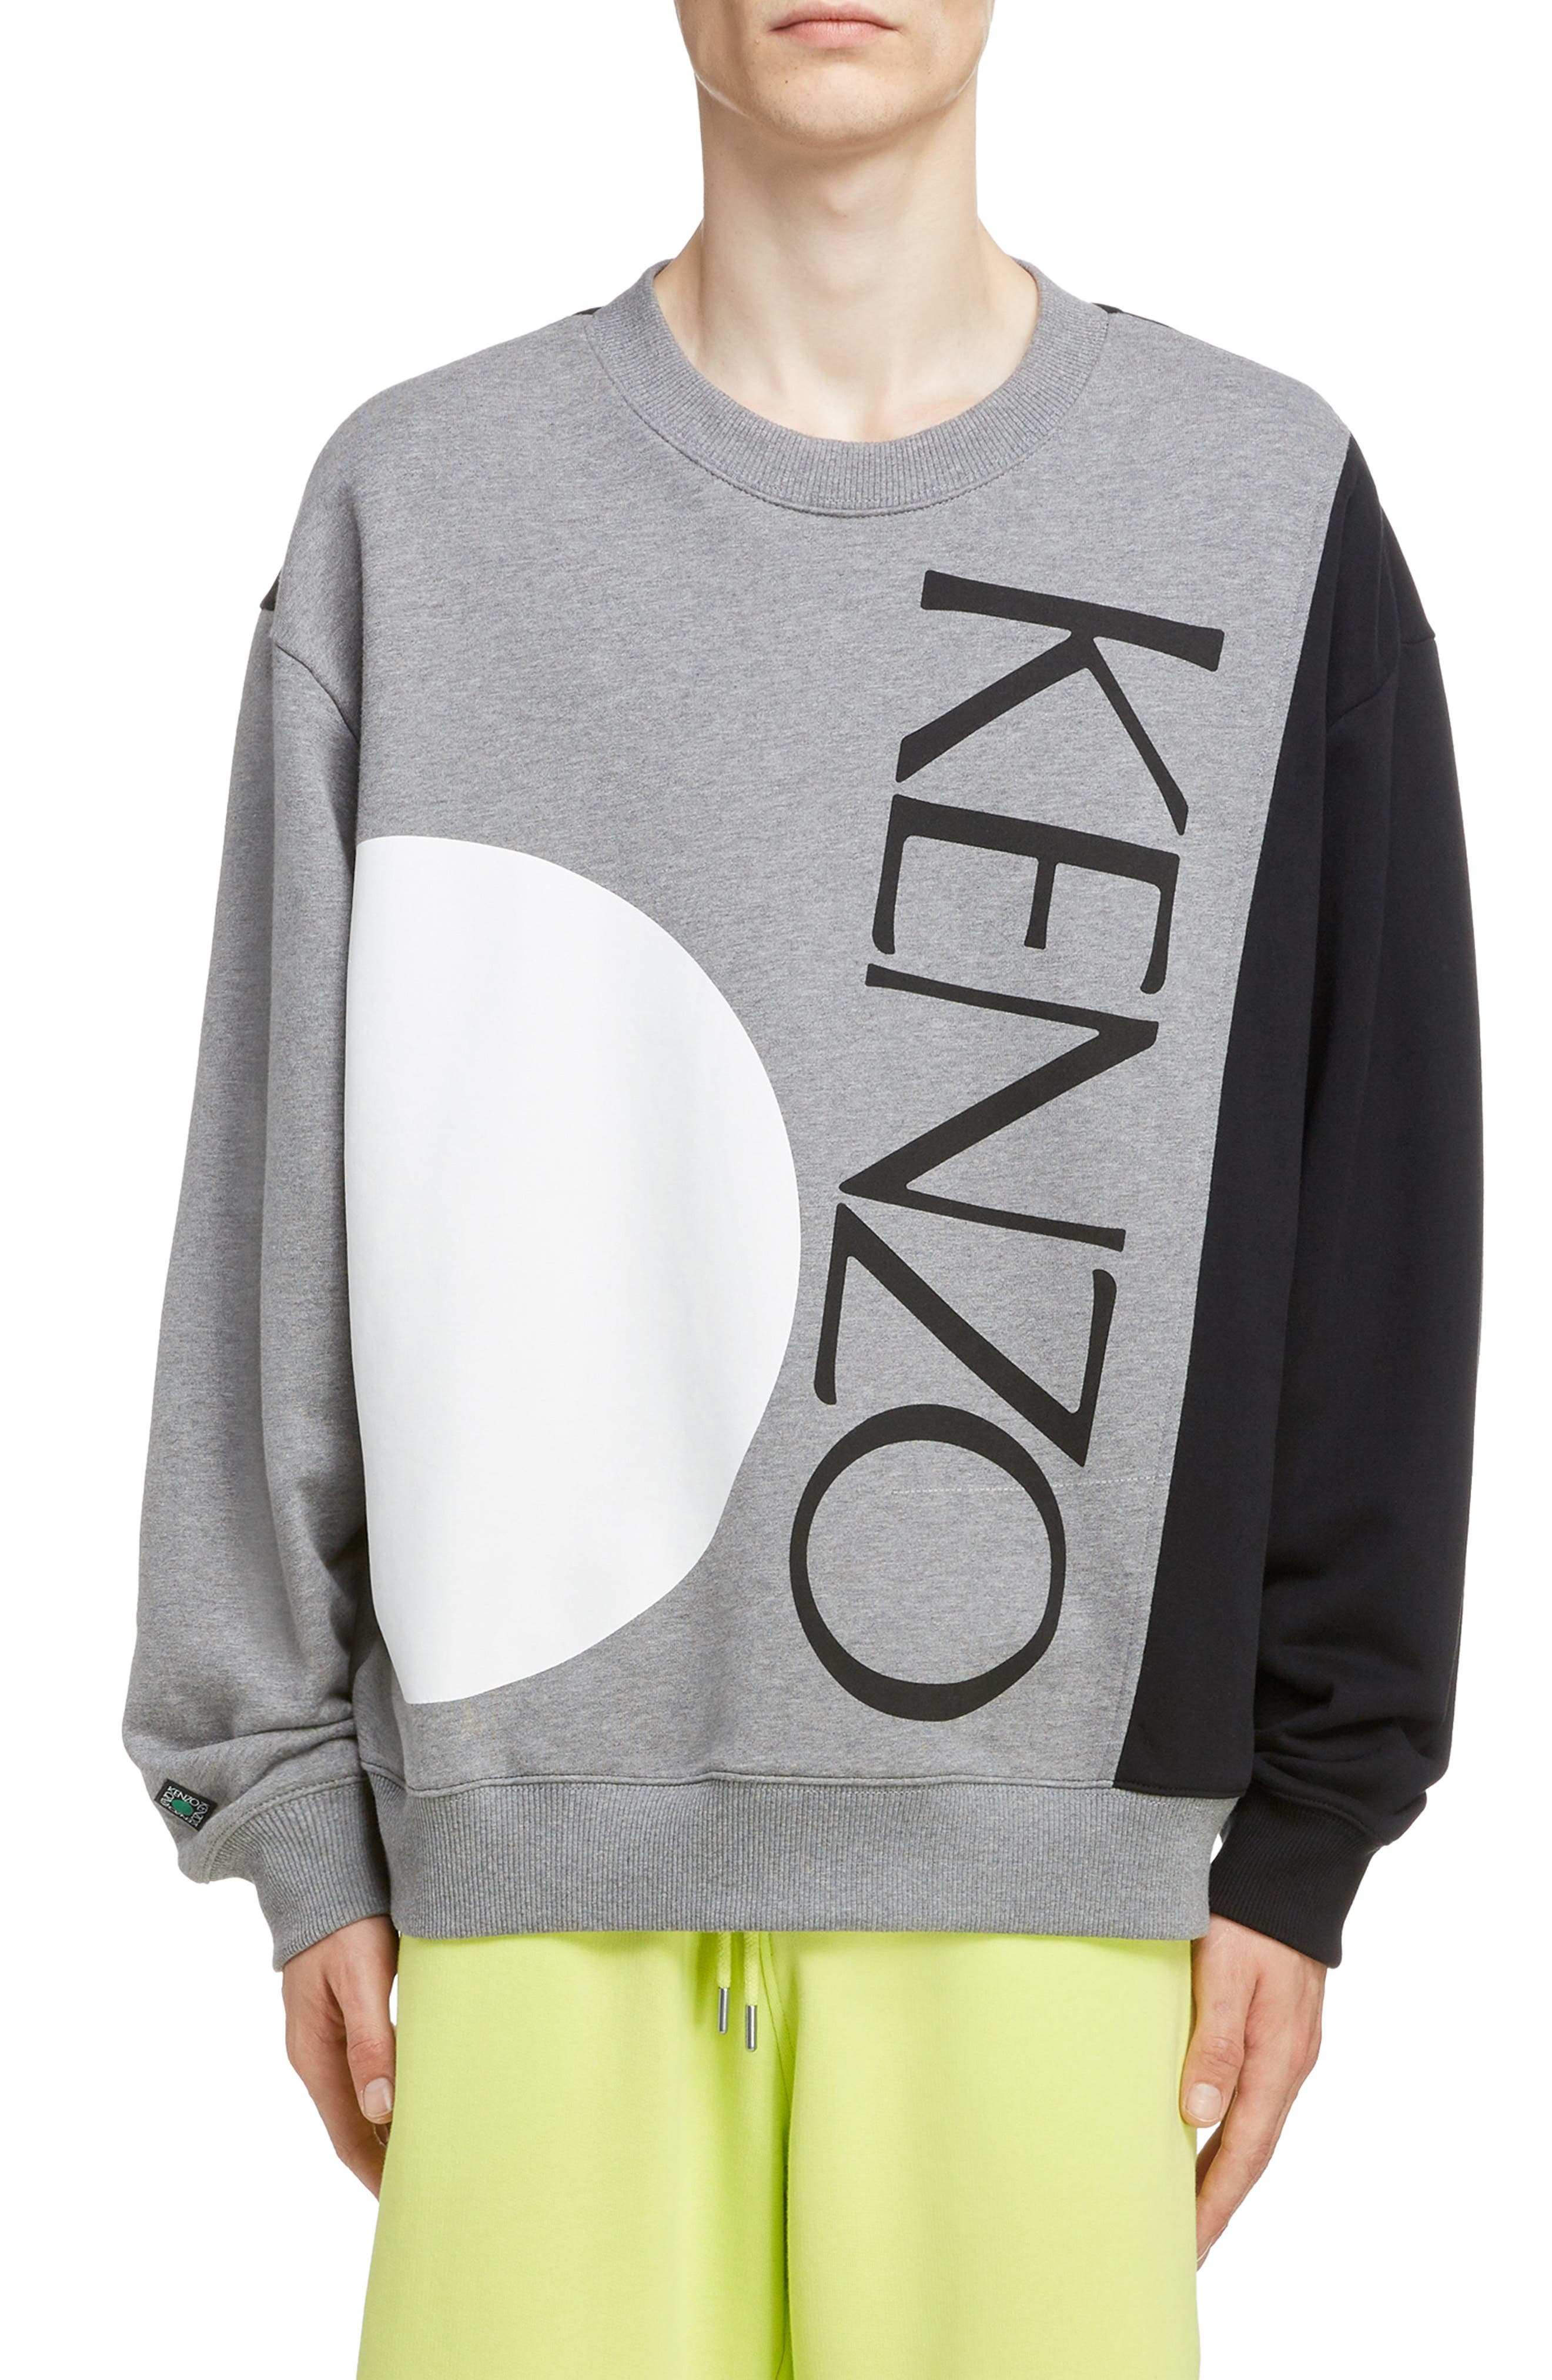 KENZO, Oversize Colorblock Sweatshirt, Main thumbnail 1, color, DOVE GREY